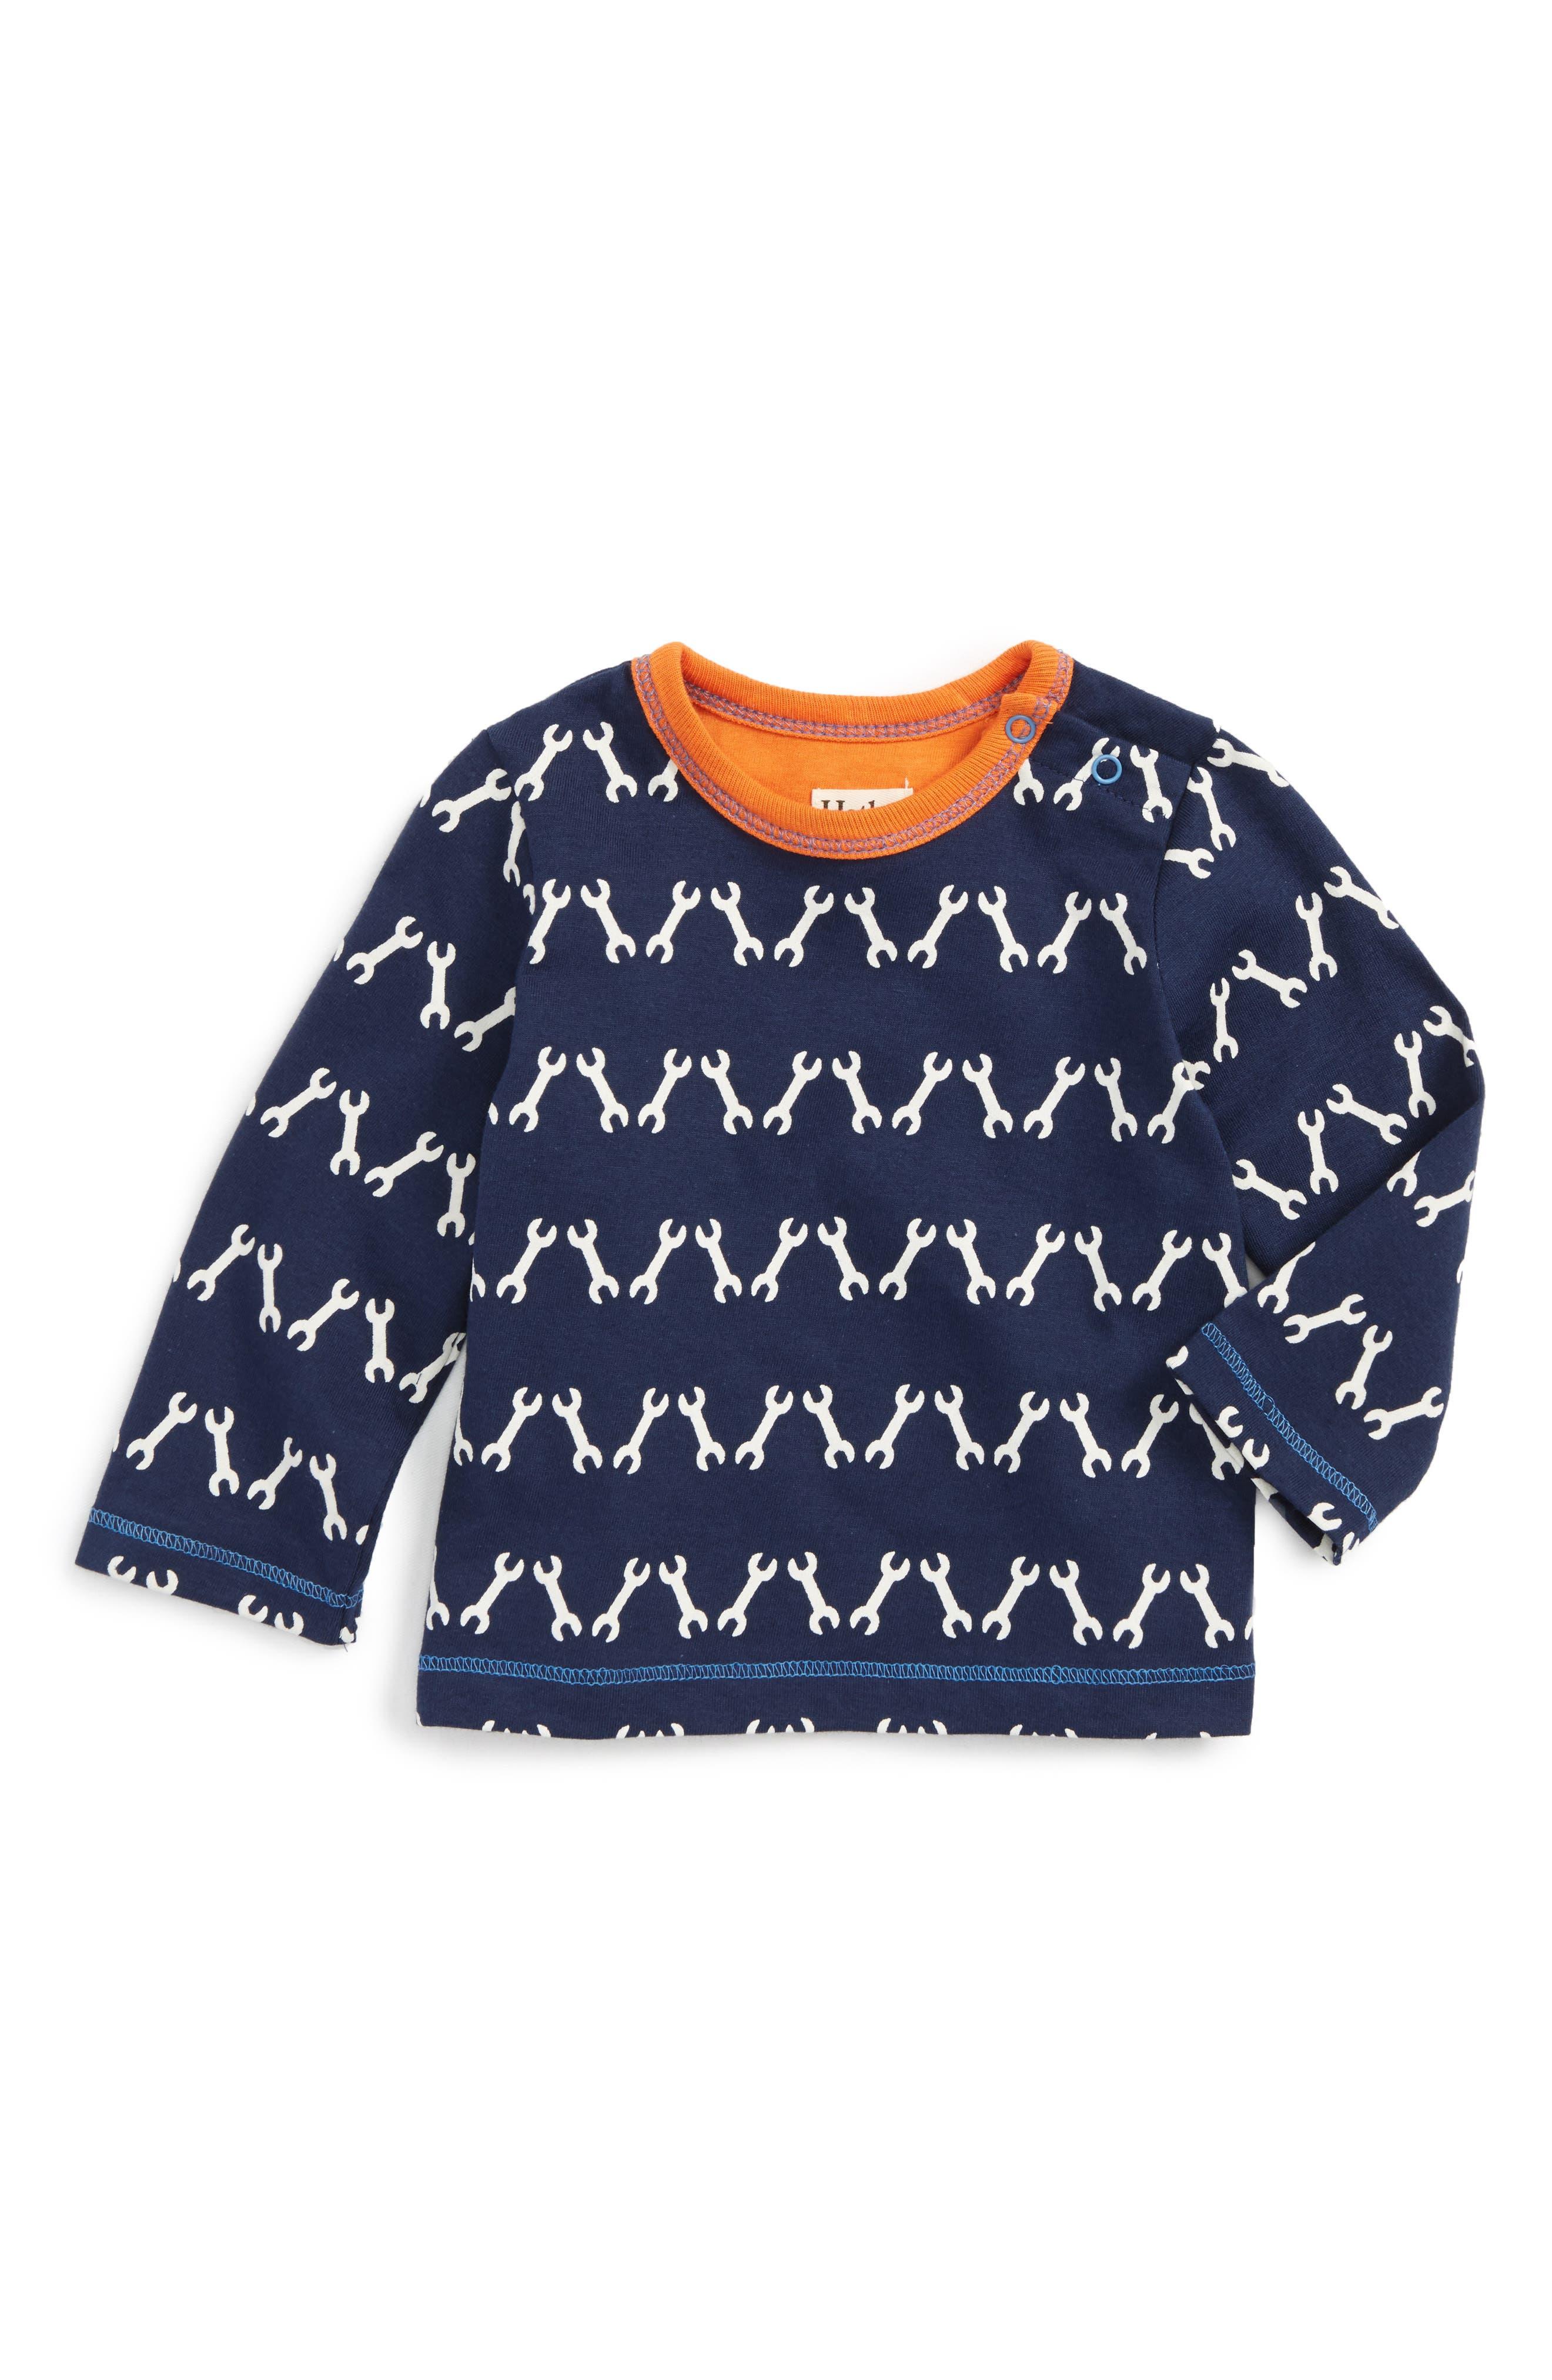 Main Image - Hatley Long Sleeve T-Shirt (Baby Boys)